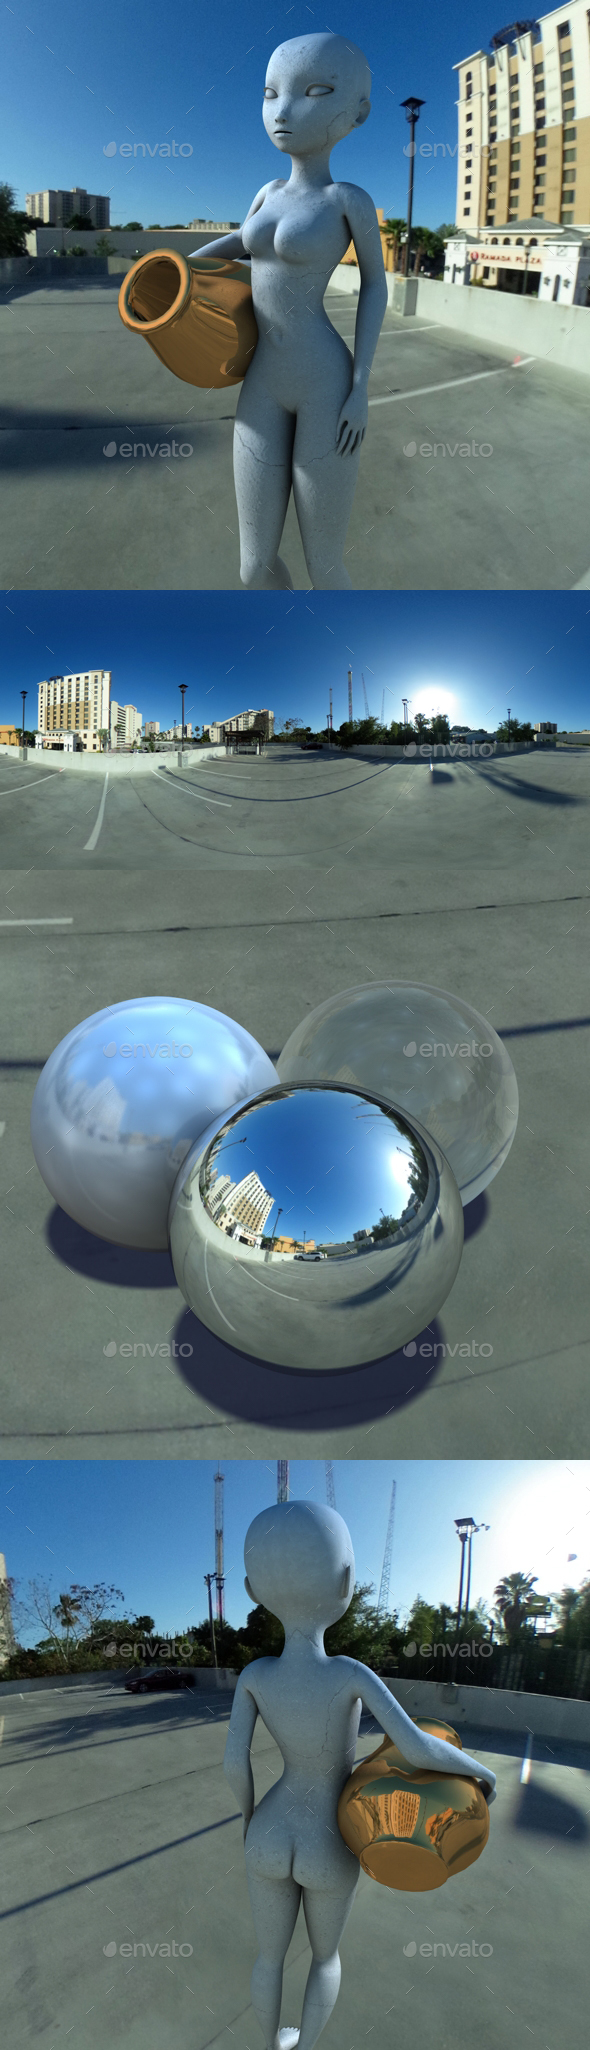 Hotel Rooftop Carpark HDRI - 3DOcean Item for Sale